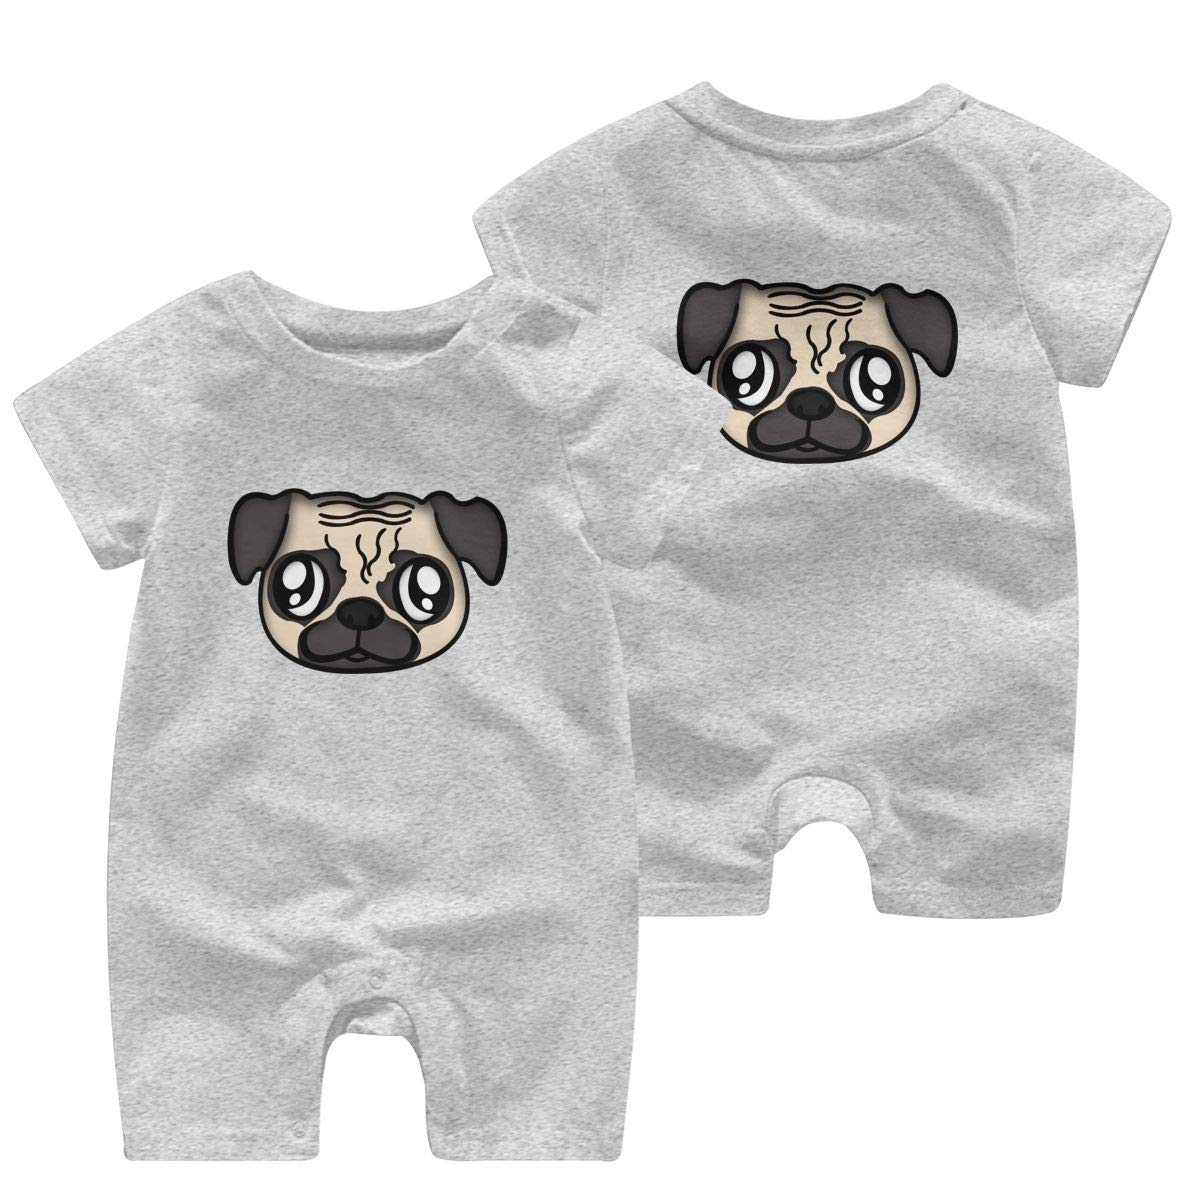 UGFGF/&3 Pug Puppy Dog Face Baby Boy Short Sleeve Romper Jumpsuit Kid Pajamas 0-24 Months